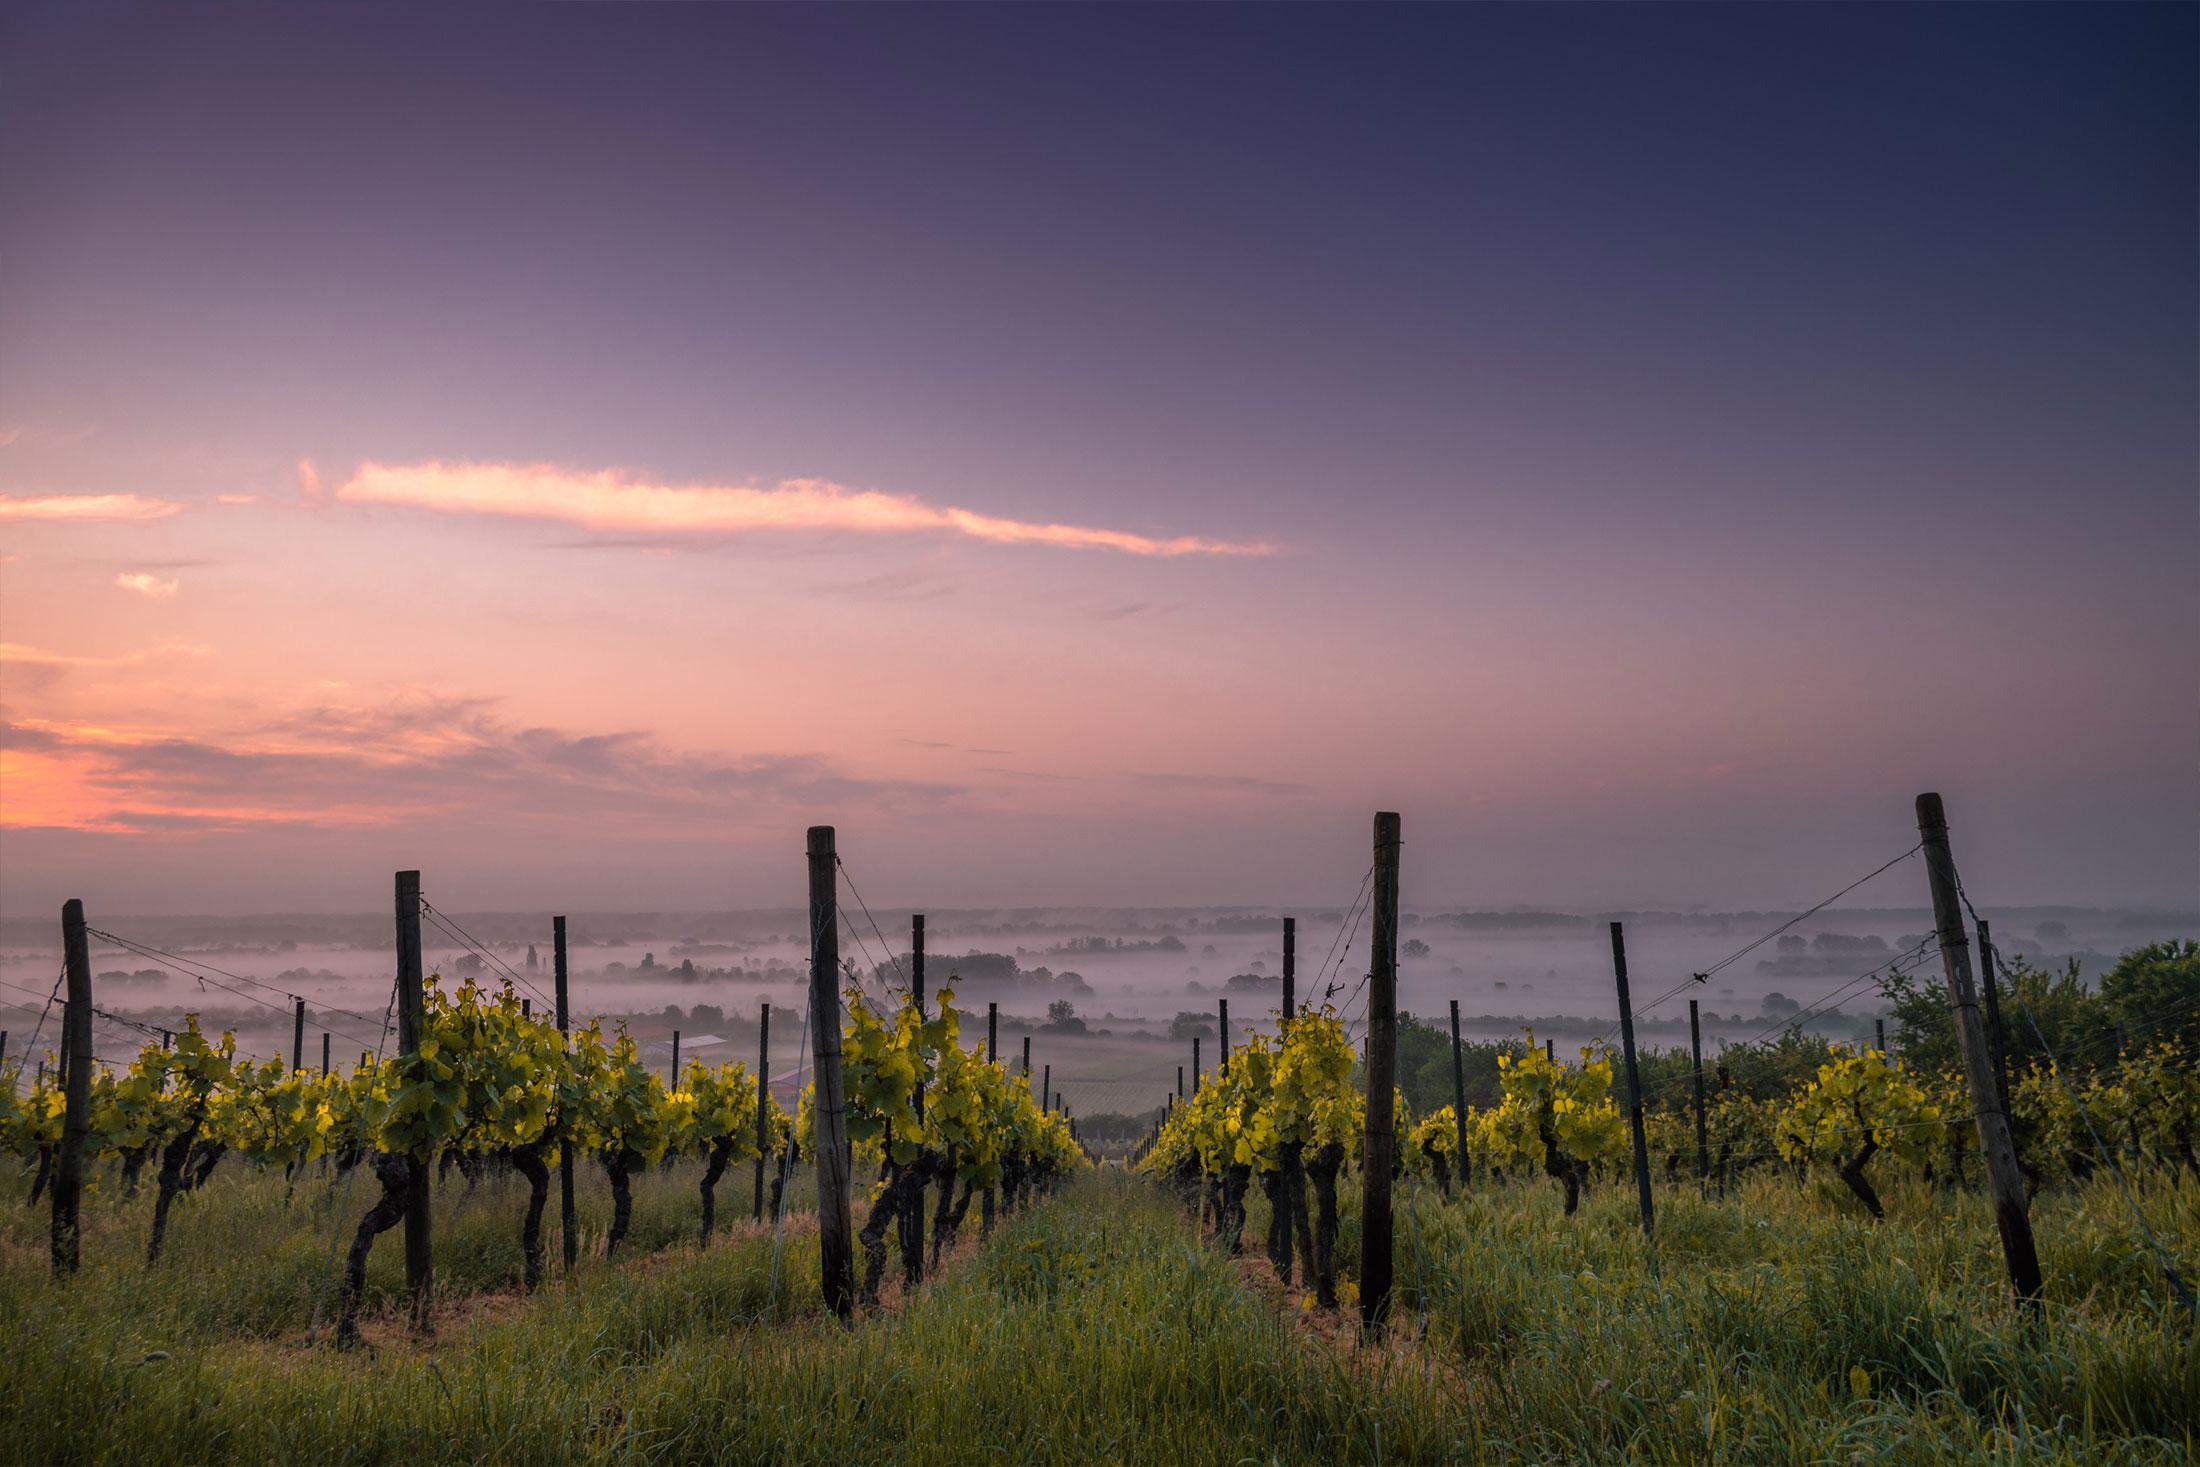 twilight at vineyard with fog in the distance, vineyard at dusk, flextank vineyard